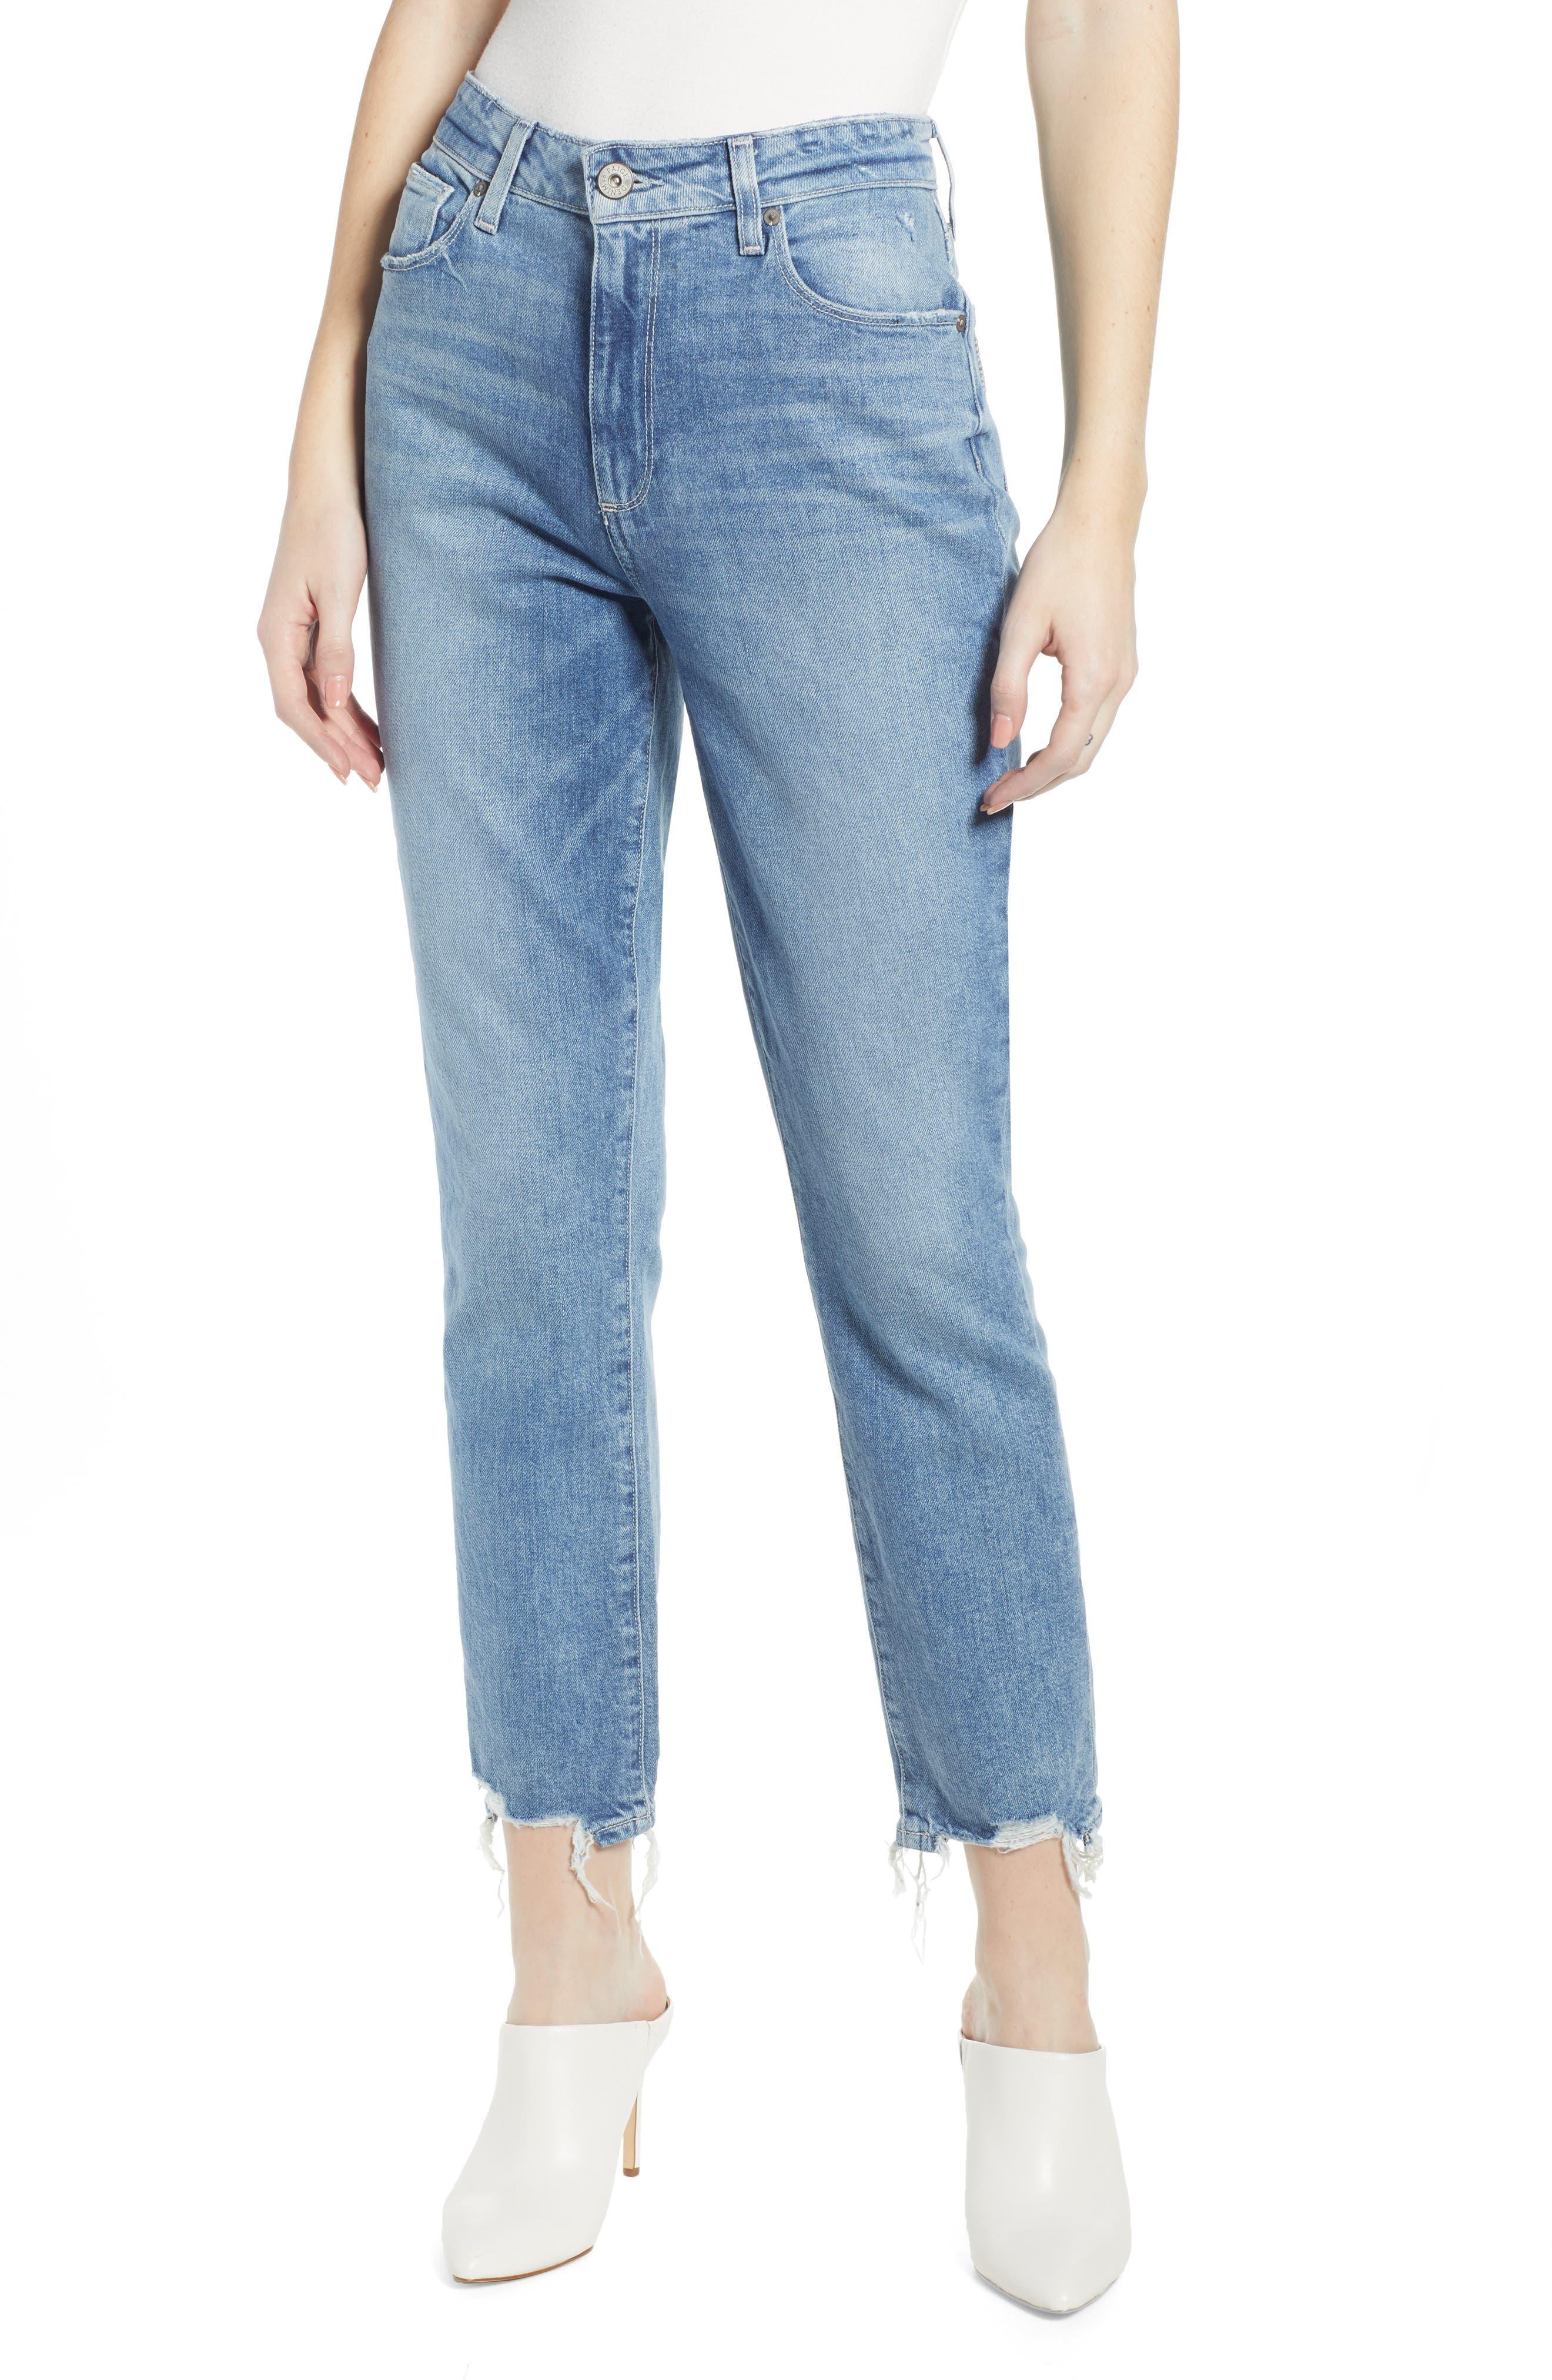 Women's Paige Vintage - Sarah High Waist Ankle Slim Jeans